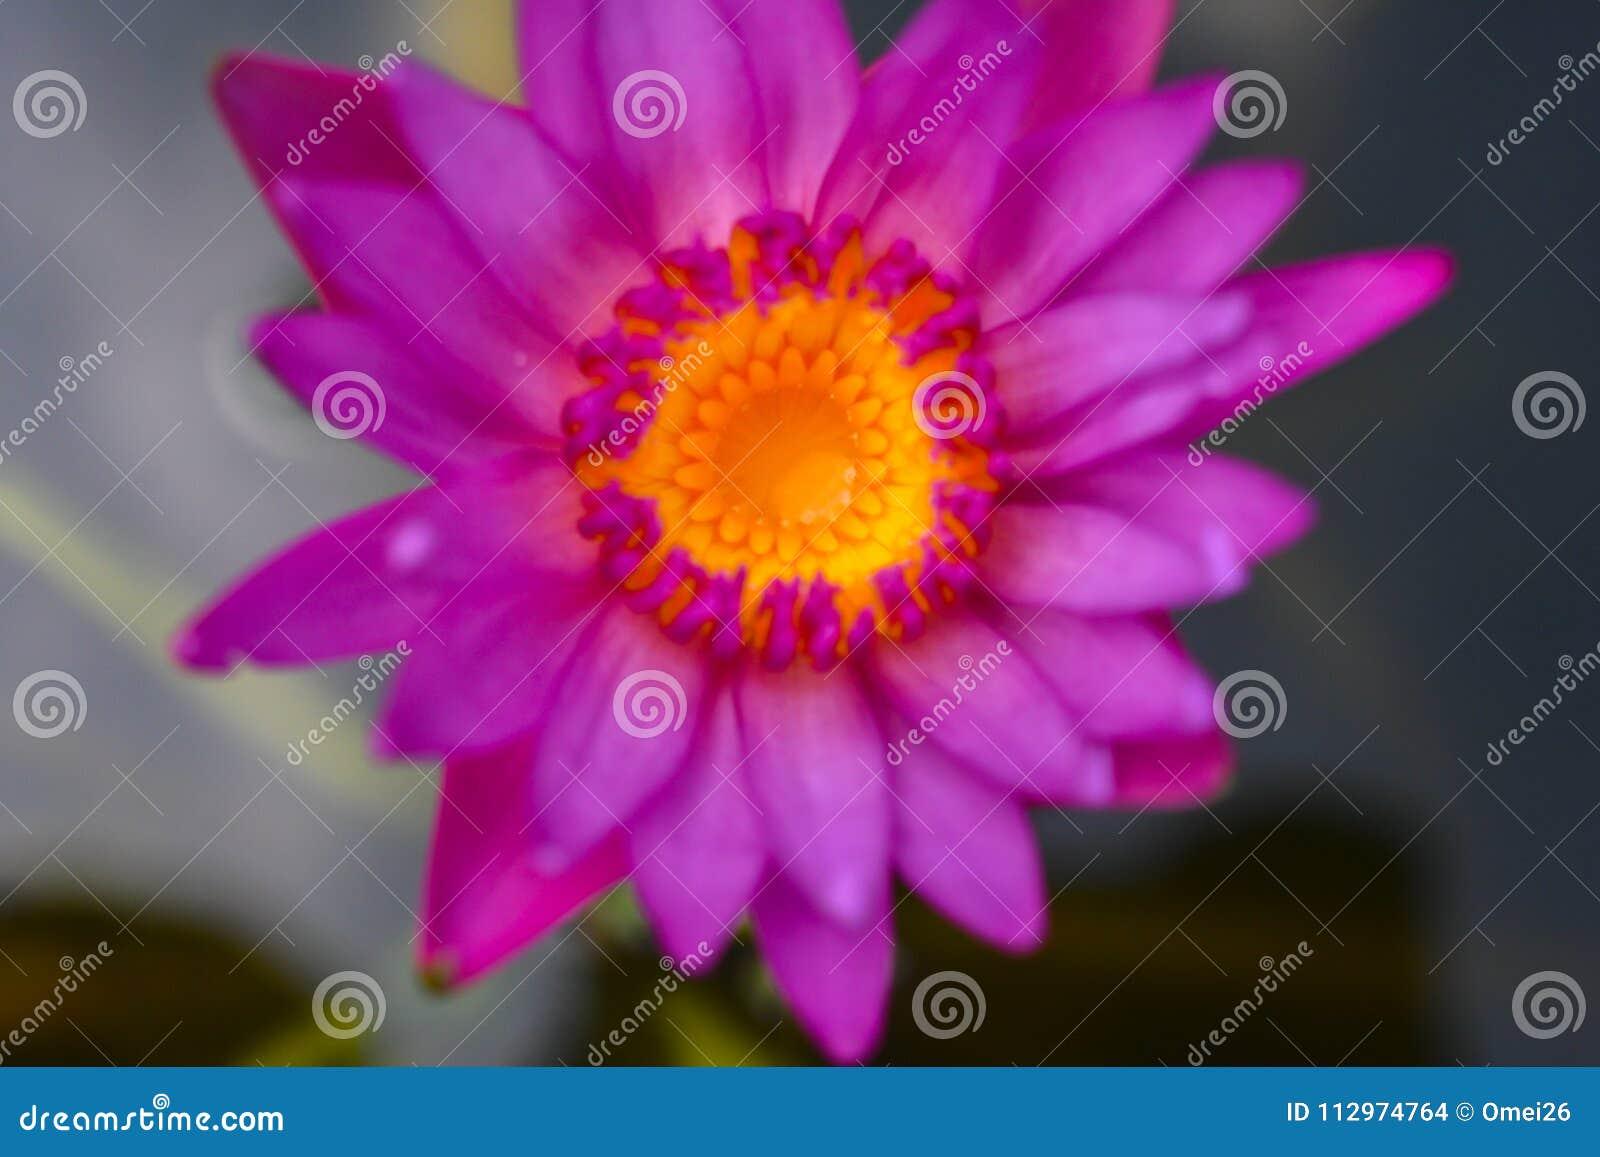 Beautiful lotus flowers or waterlily in pond stock photo image of beautiful lotus flowers or waterlily in pond izmirmasajfo